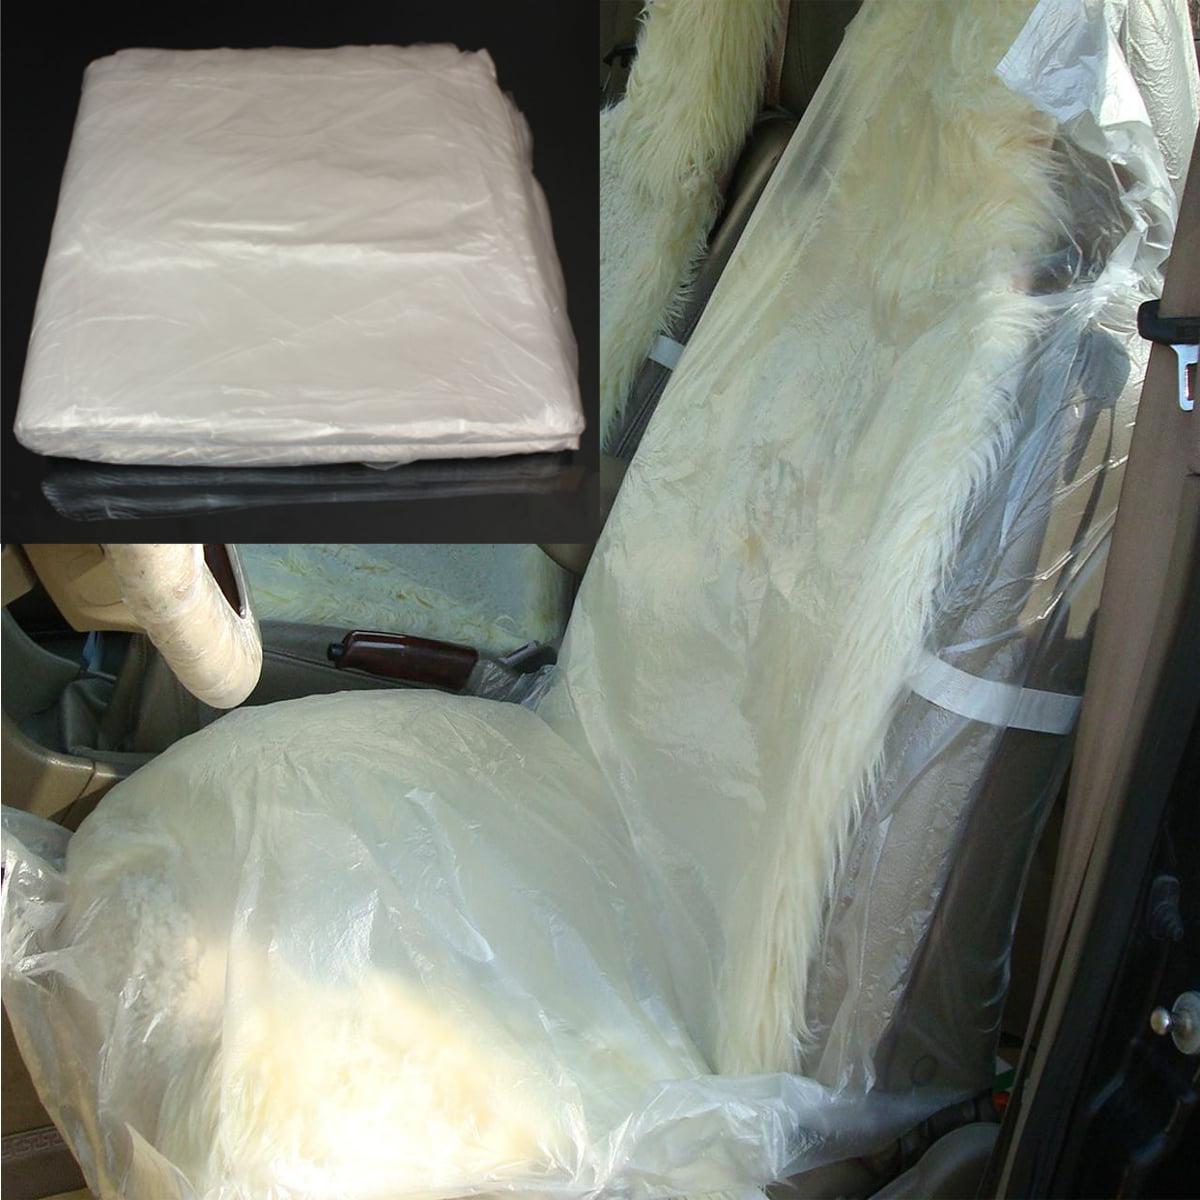 100pcs Pack Disposable Clear Plastic Seat Protect Cover Protector Mechanic Valet Waterproof Dust Water Resistant Vehicle SUV Van Caravan Truck US